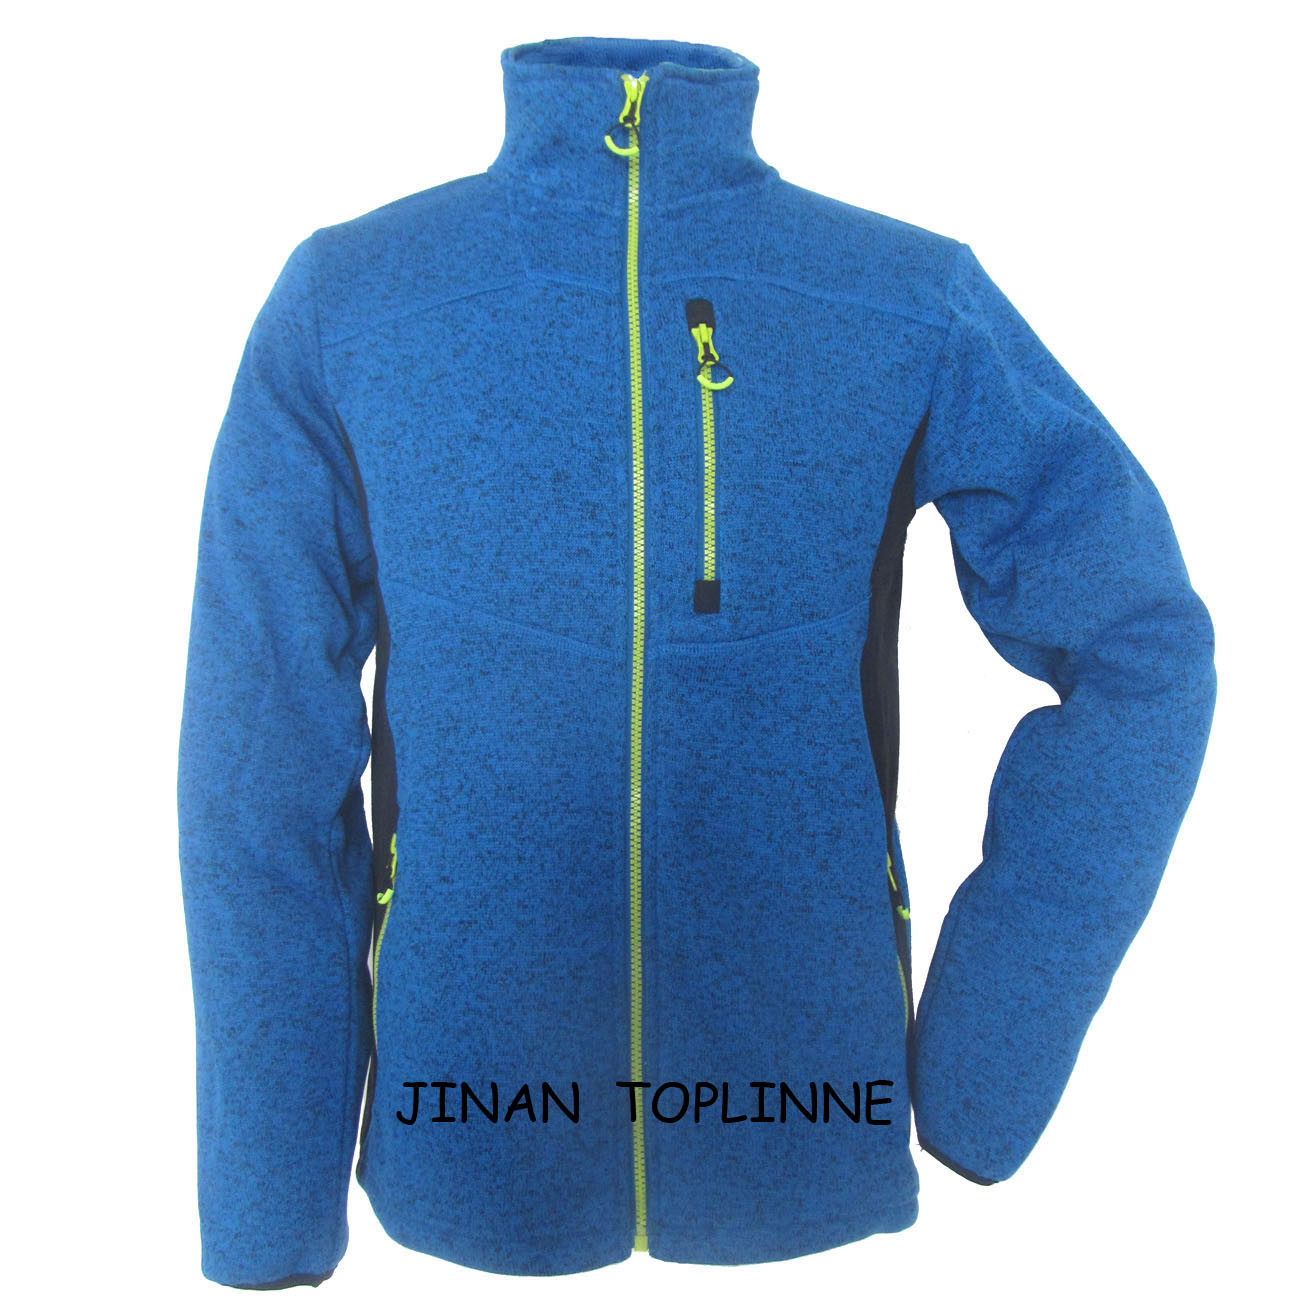 Women Cationic Dyed Cationic Fabric Jacket Cation